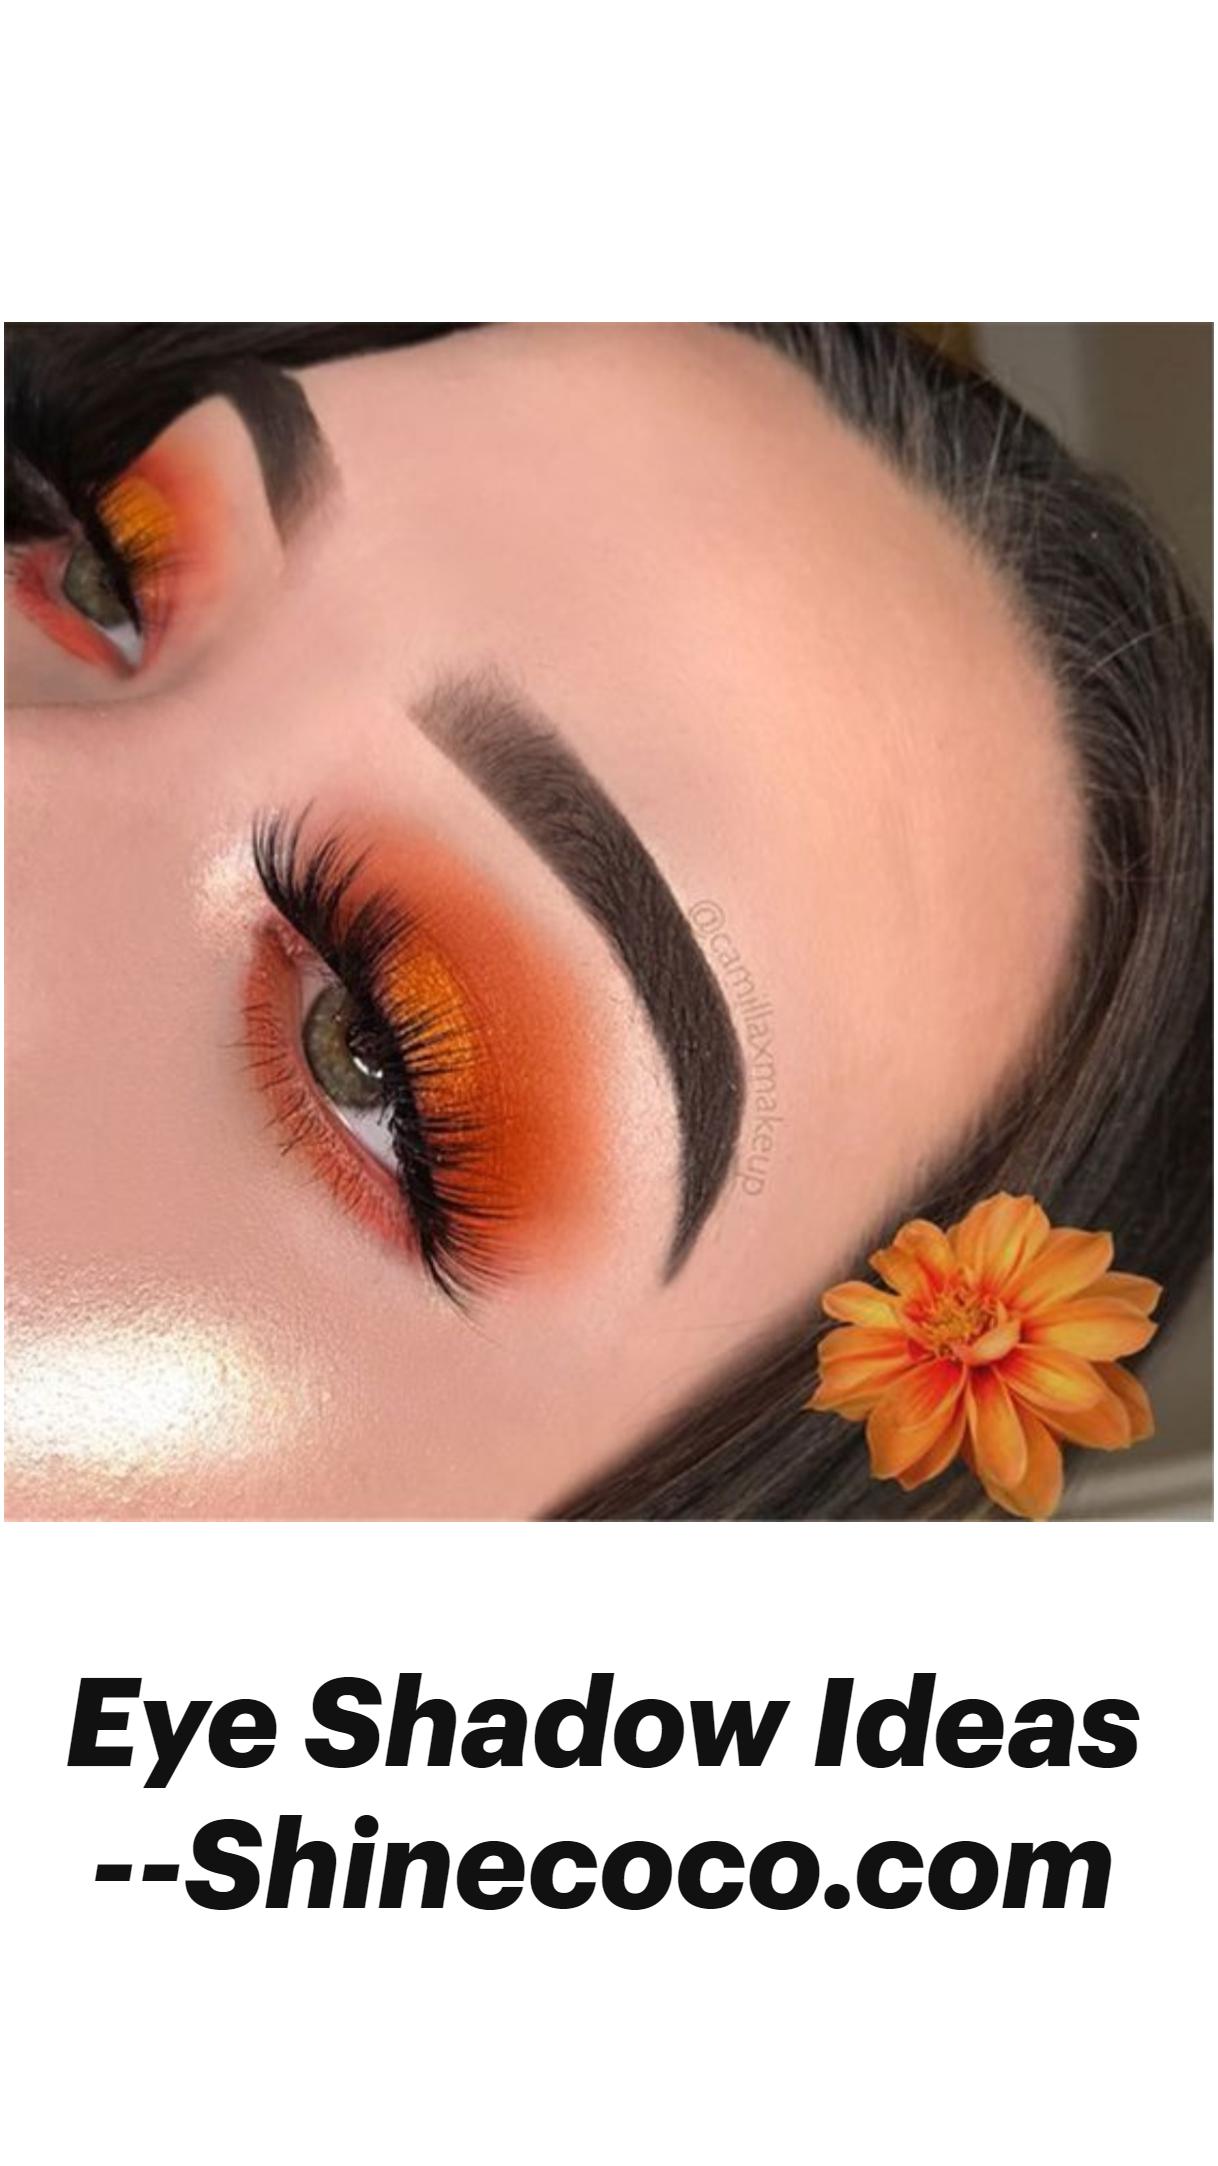 Eye Shadow Ideas –Shinecoco.com